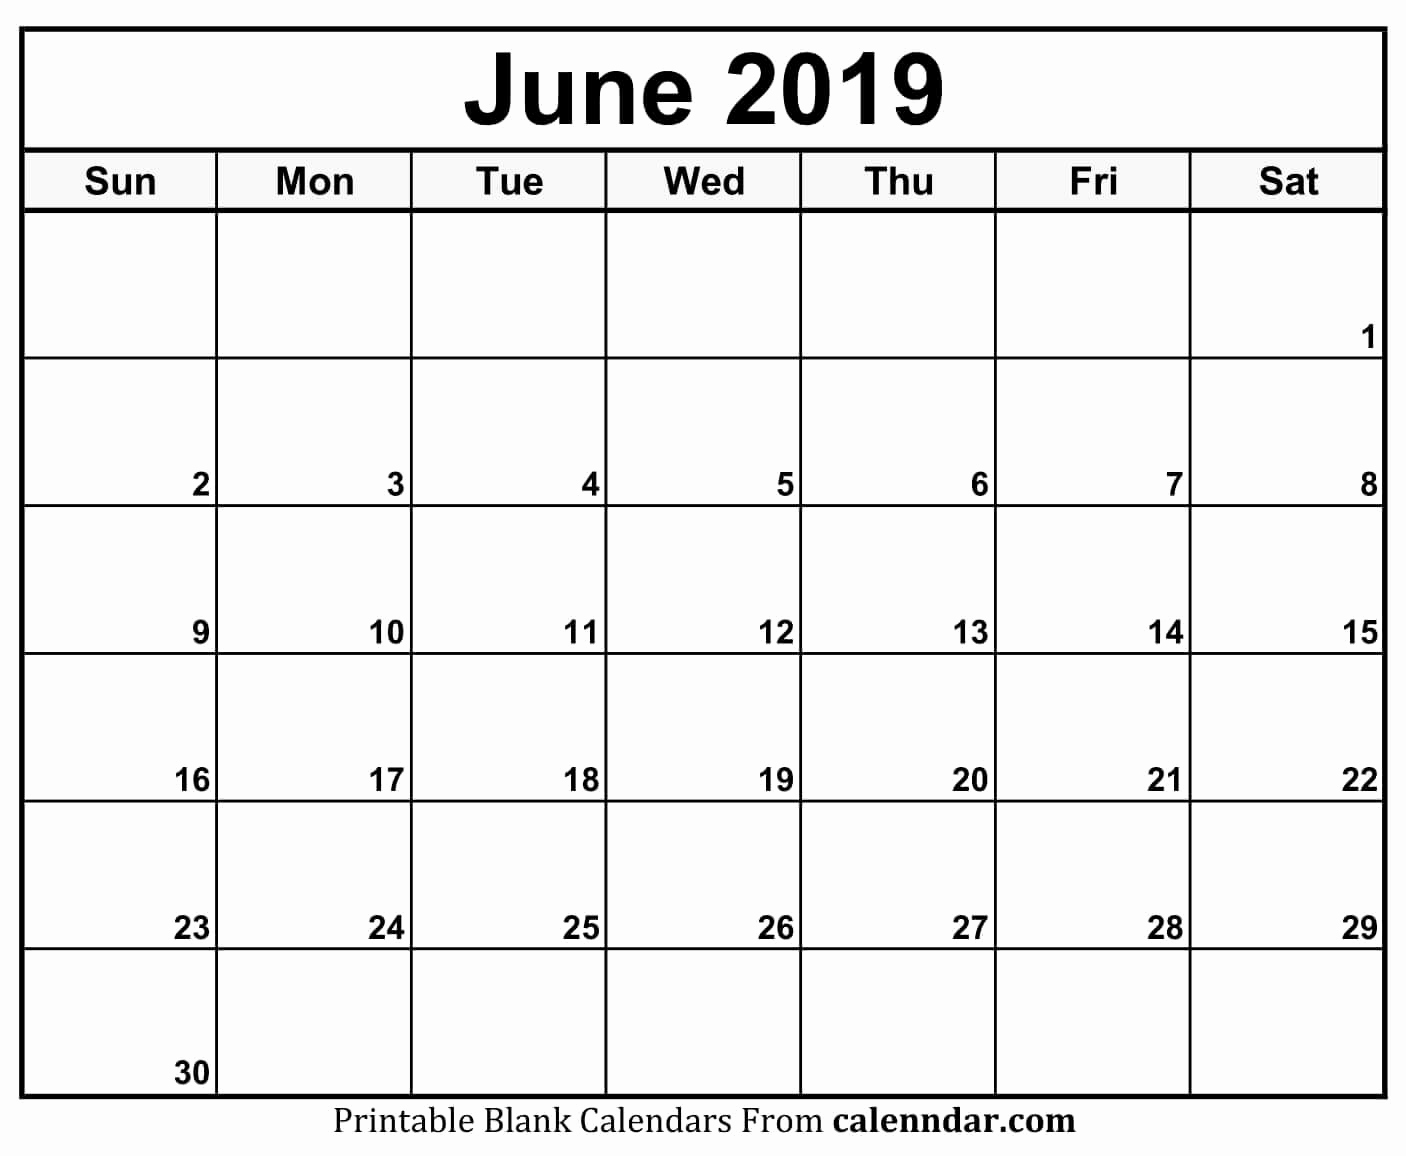 Elegant 32 Design Free Printable Calendars July 2019 Thru June